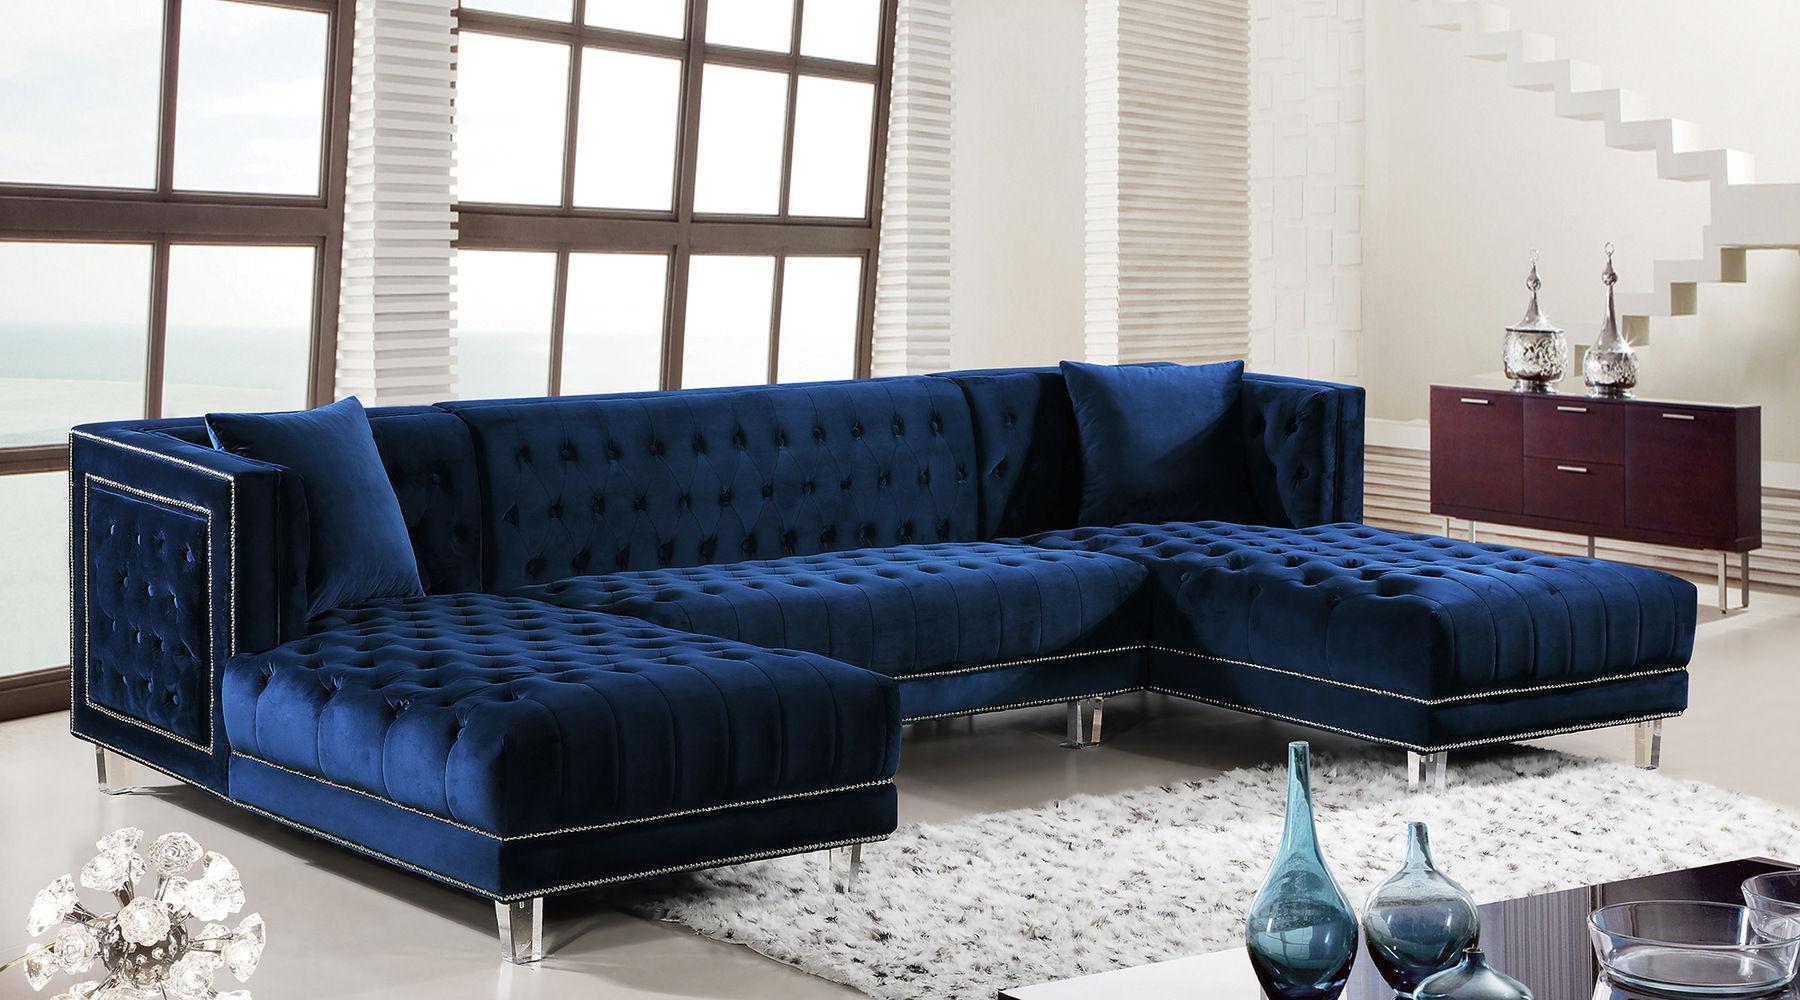 Moda Blue Sectional Sofa 631 Suzanne